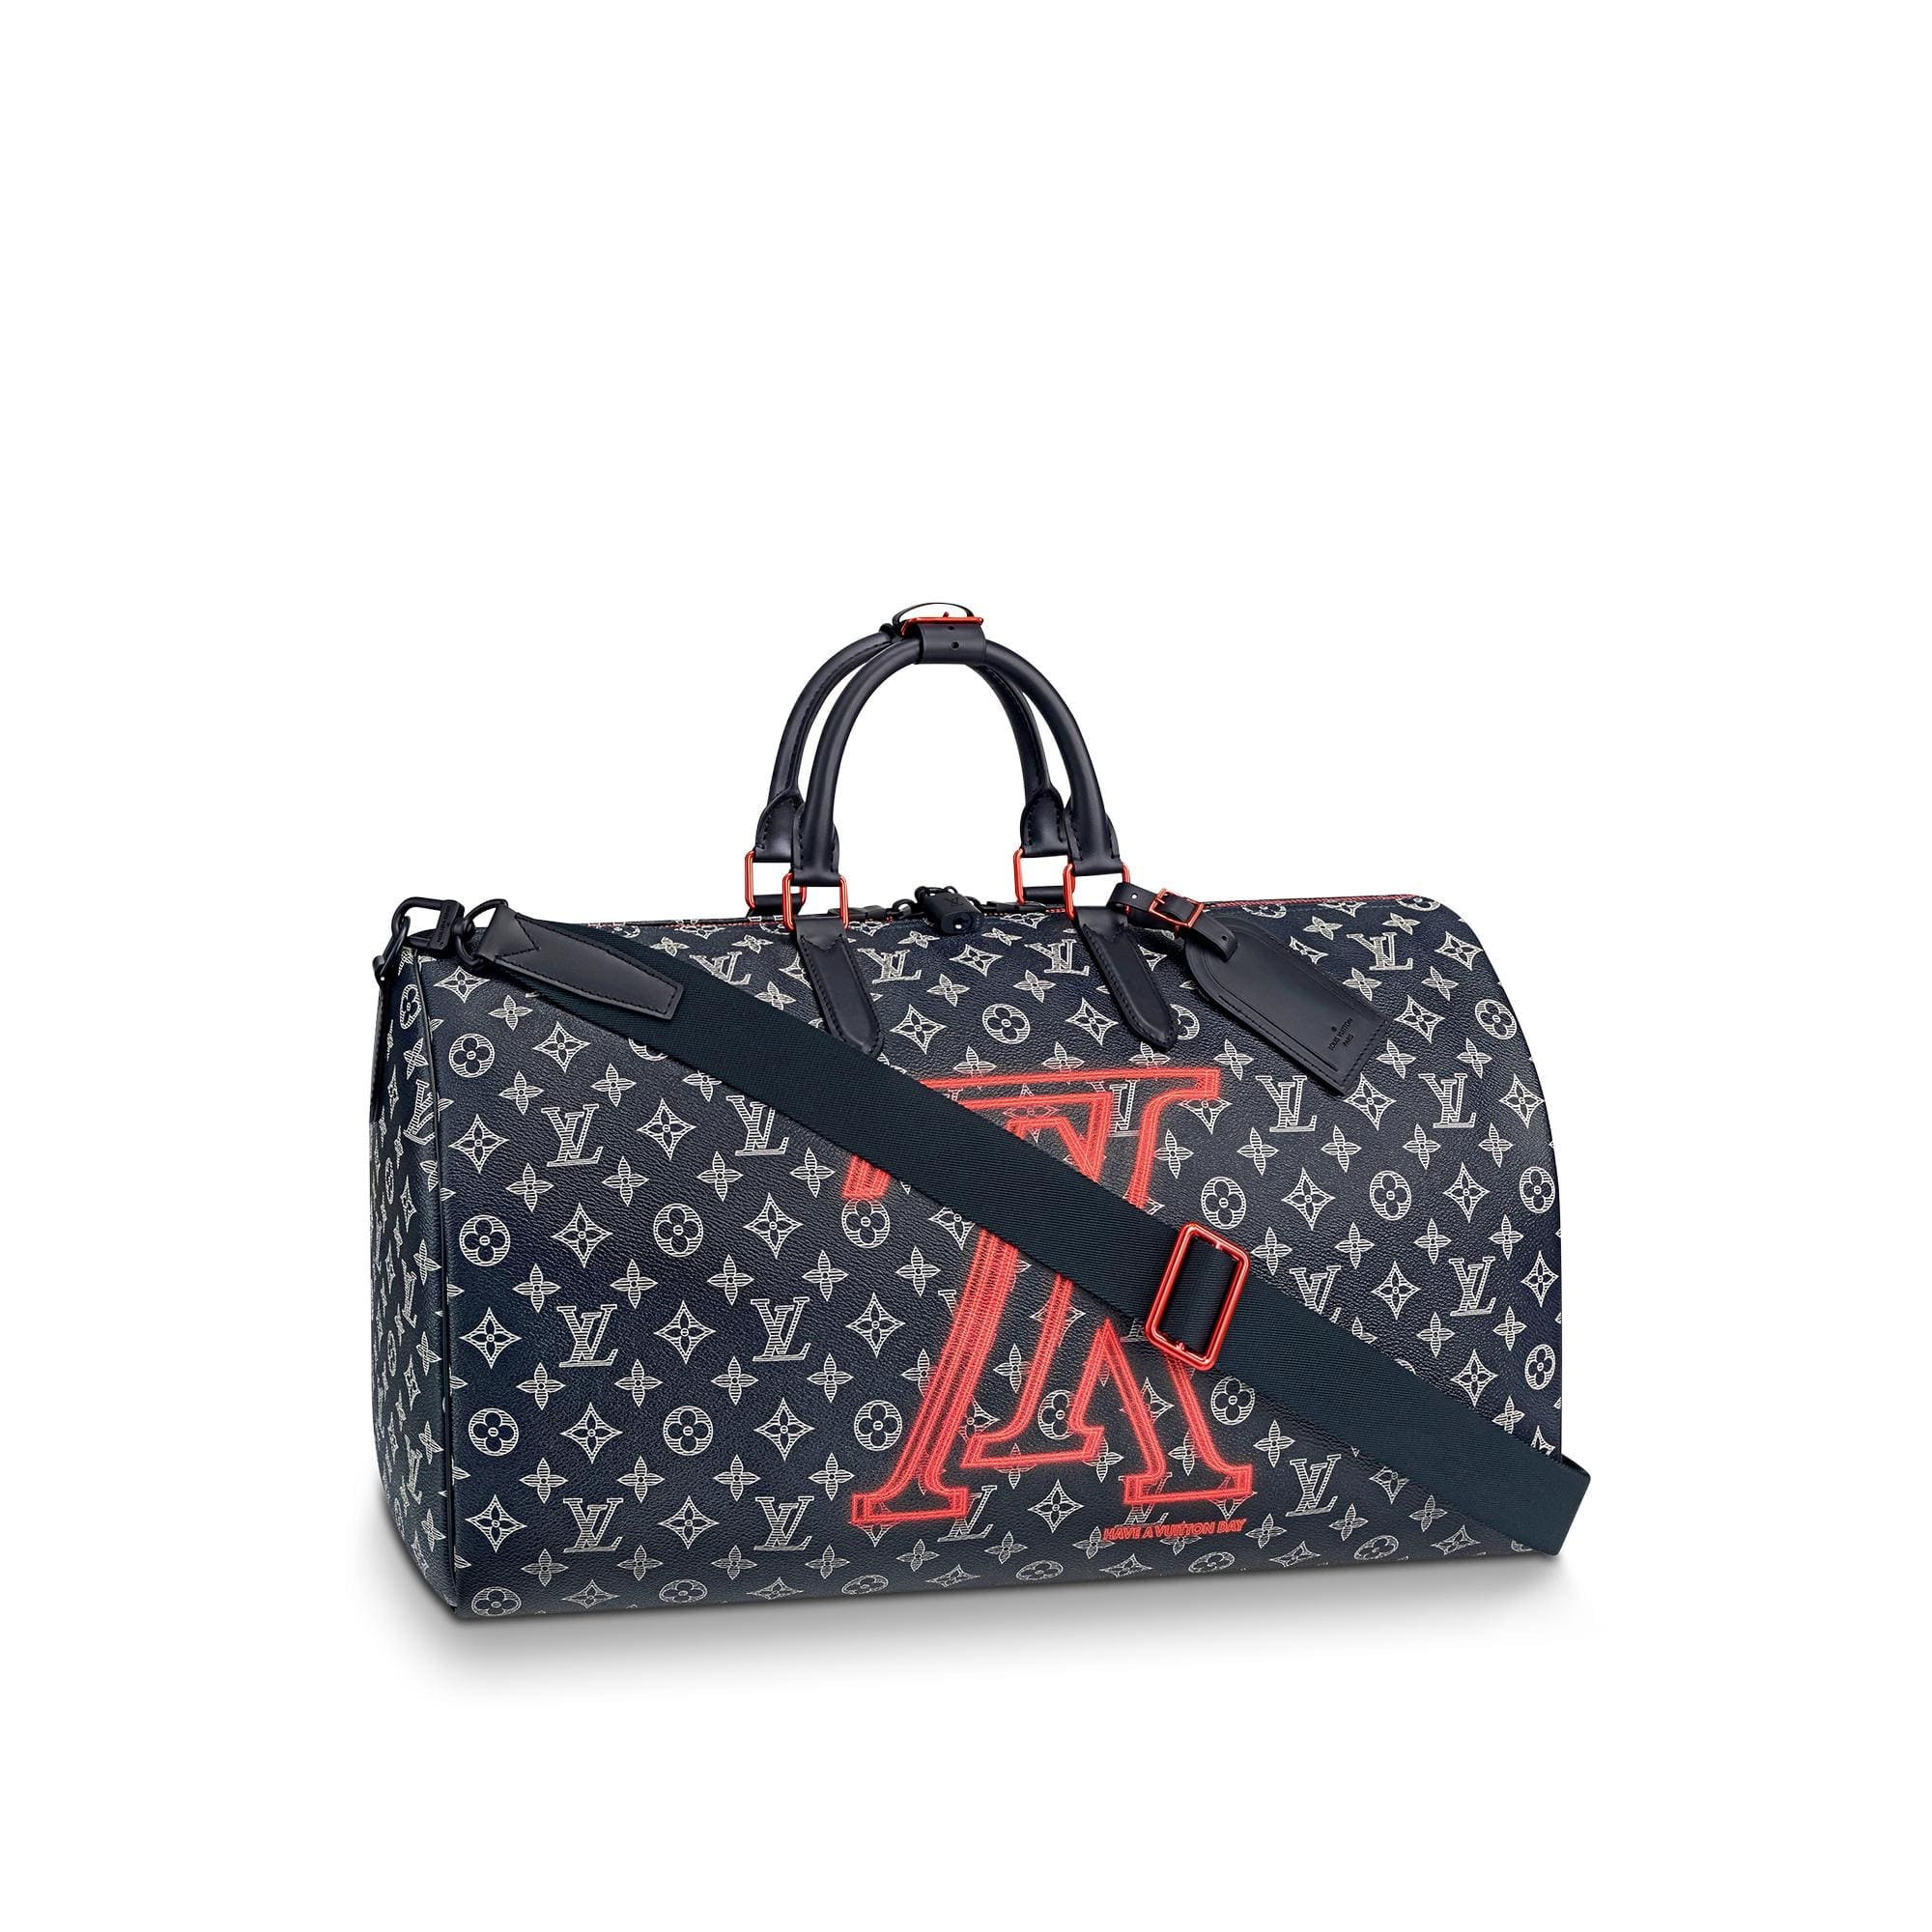 Louis Vuitton 50 Keepall Bandouliere Monogram Upside Down Ink Navy